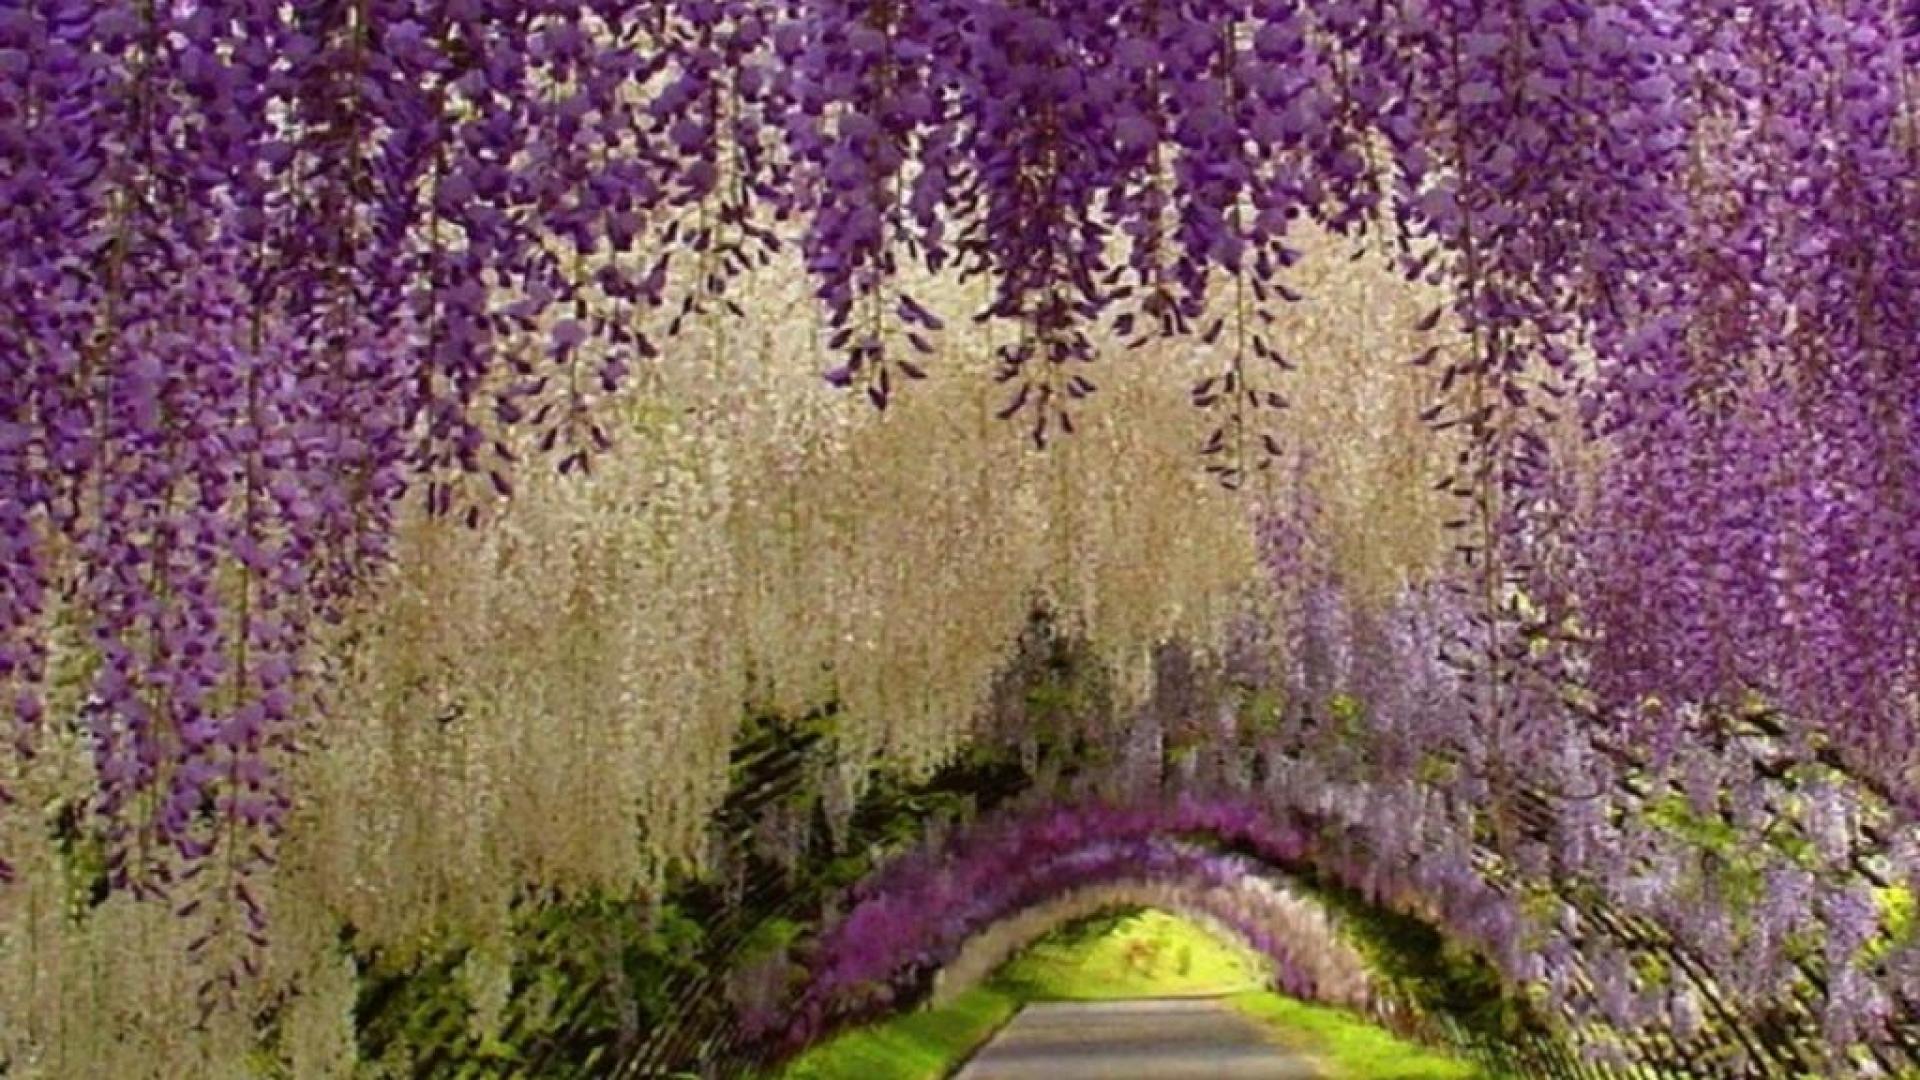 Widescreen resolutions (16:10): 1280x800 1440x900 1680x1050 1920x1200. Normal resolutions: 1024x768 1280x1024. Wallpaper Tags: wisteria beautiful tunnel ...